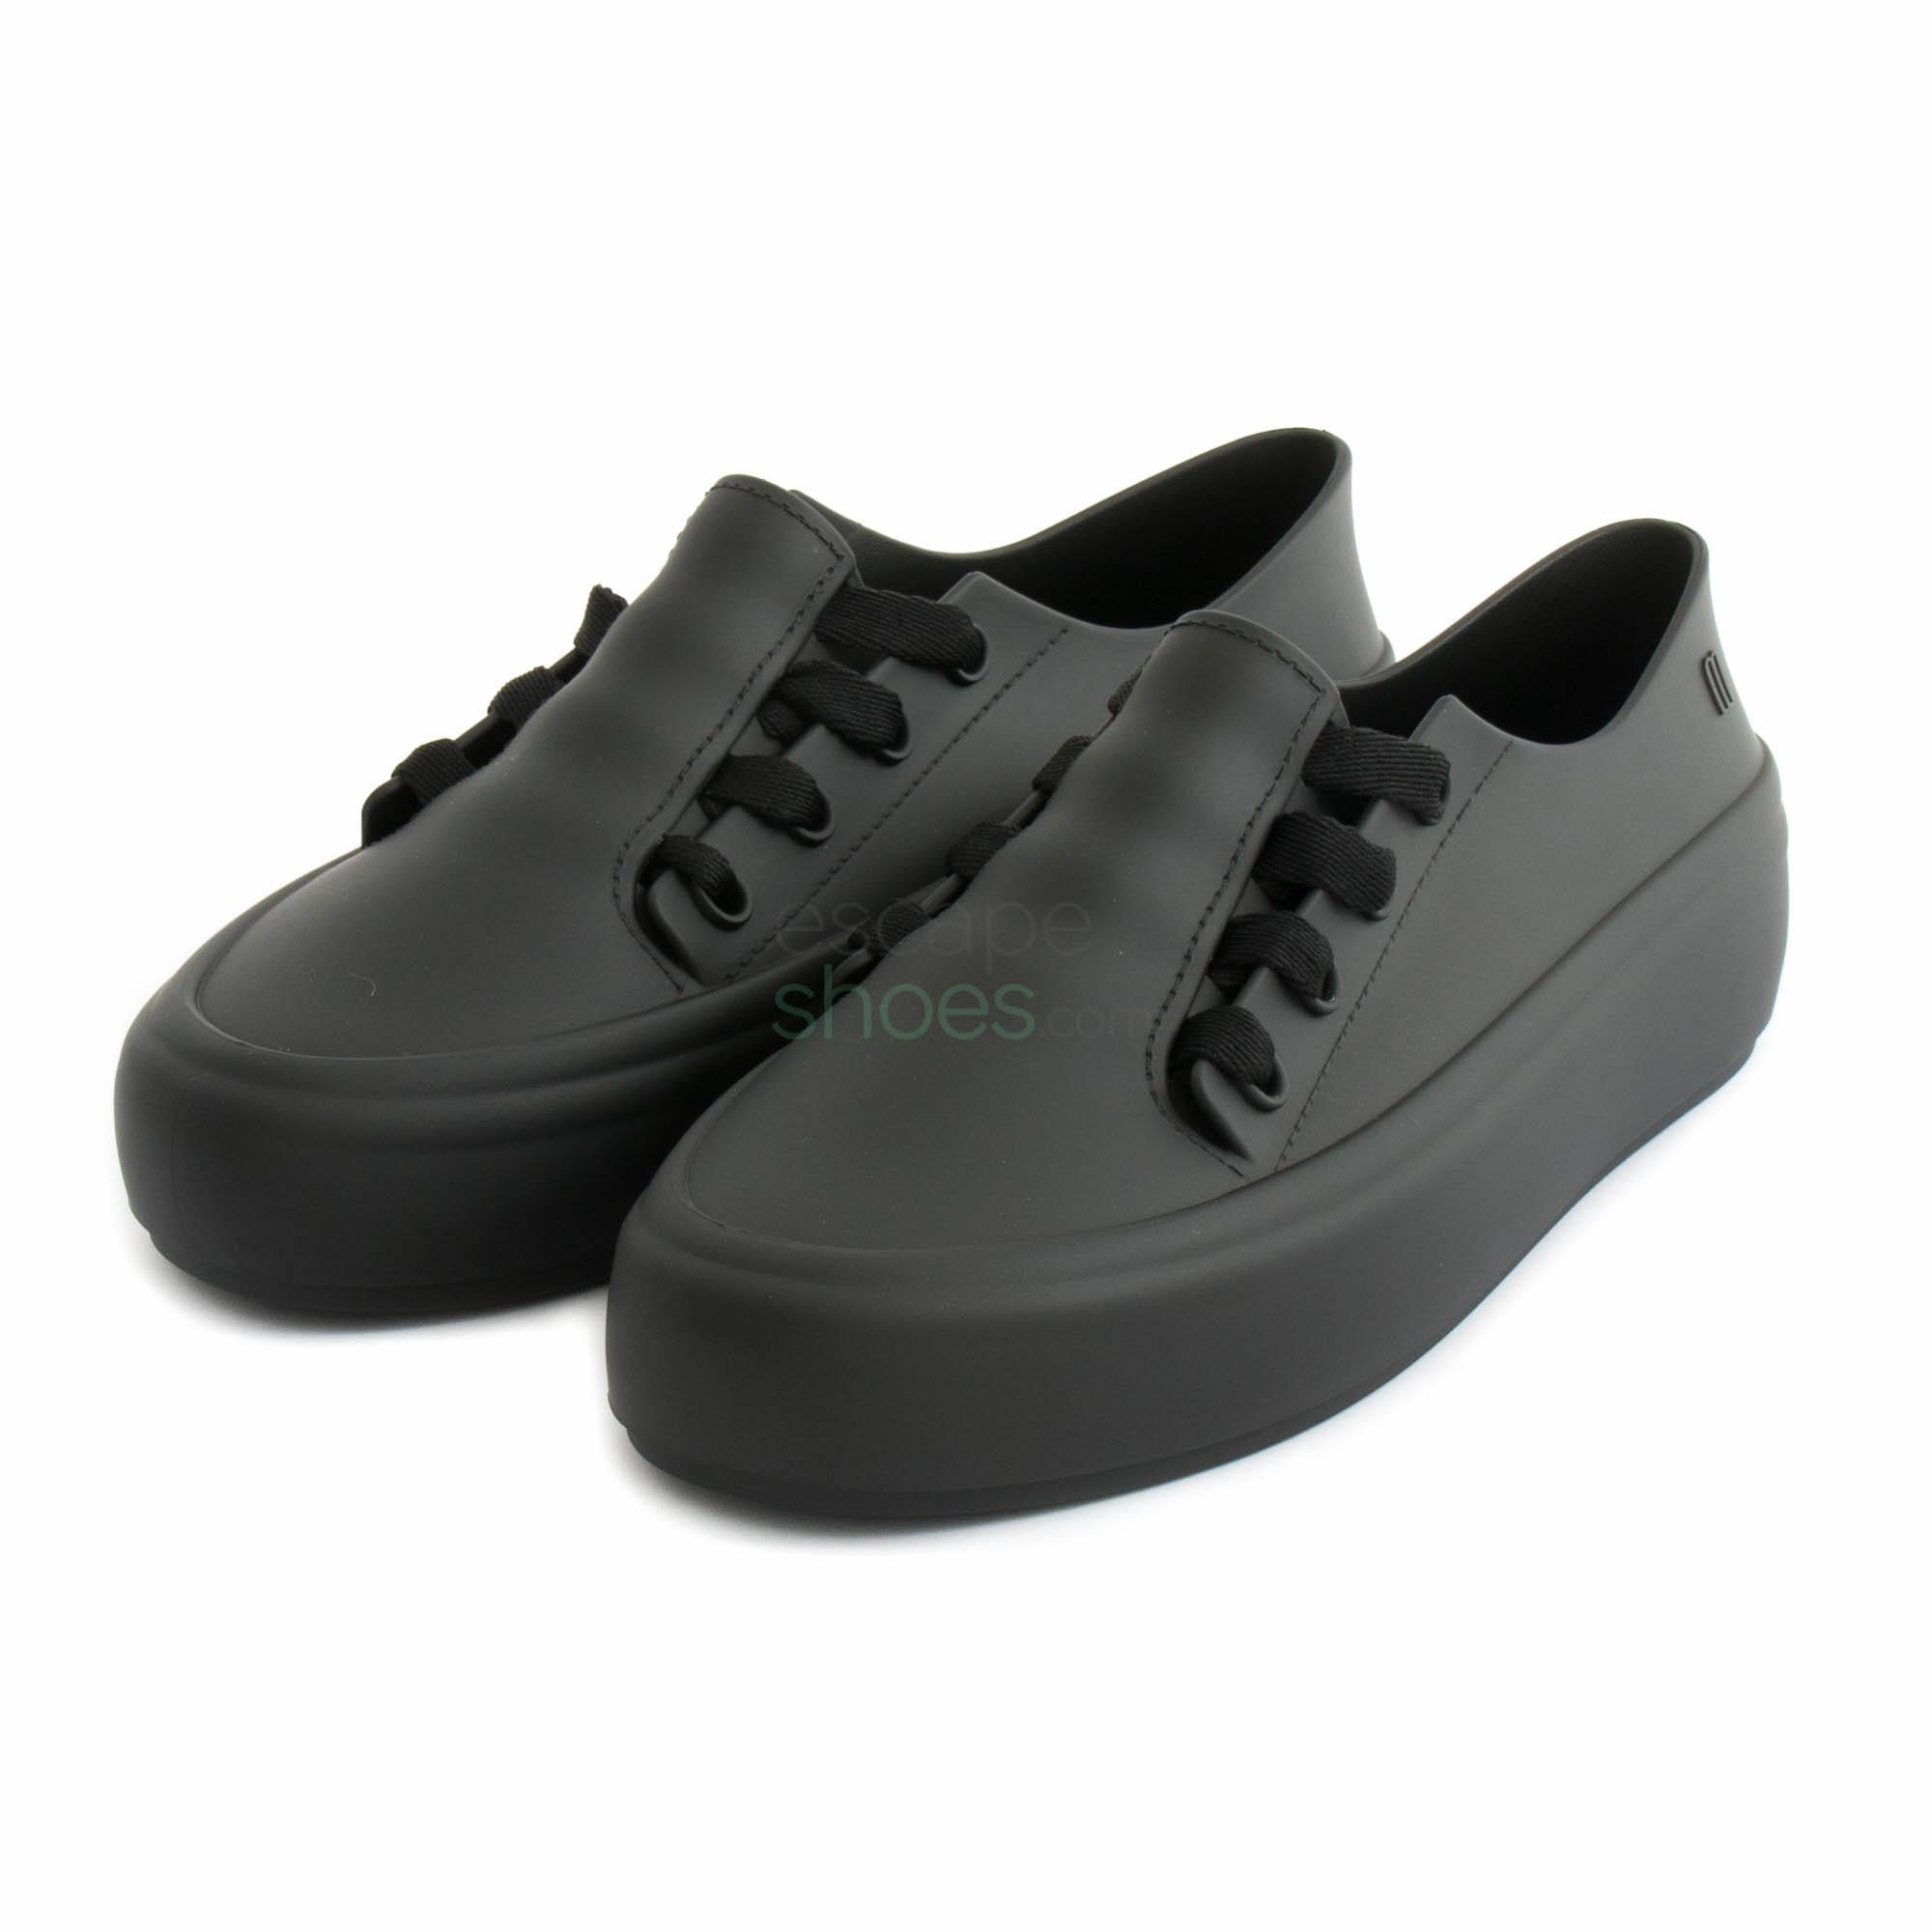 7a23f6e48d43 Buy your Sneakers MELISSA Ulitsa Black here